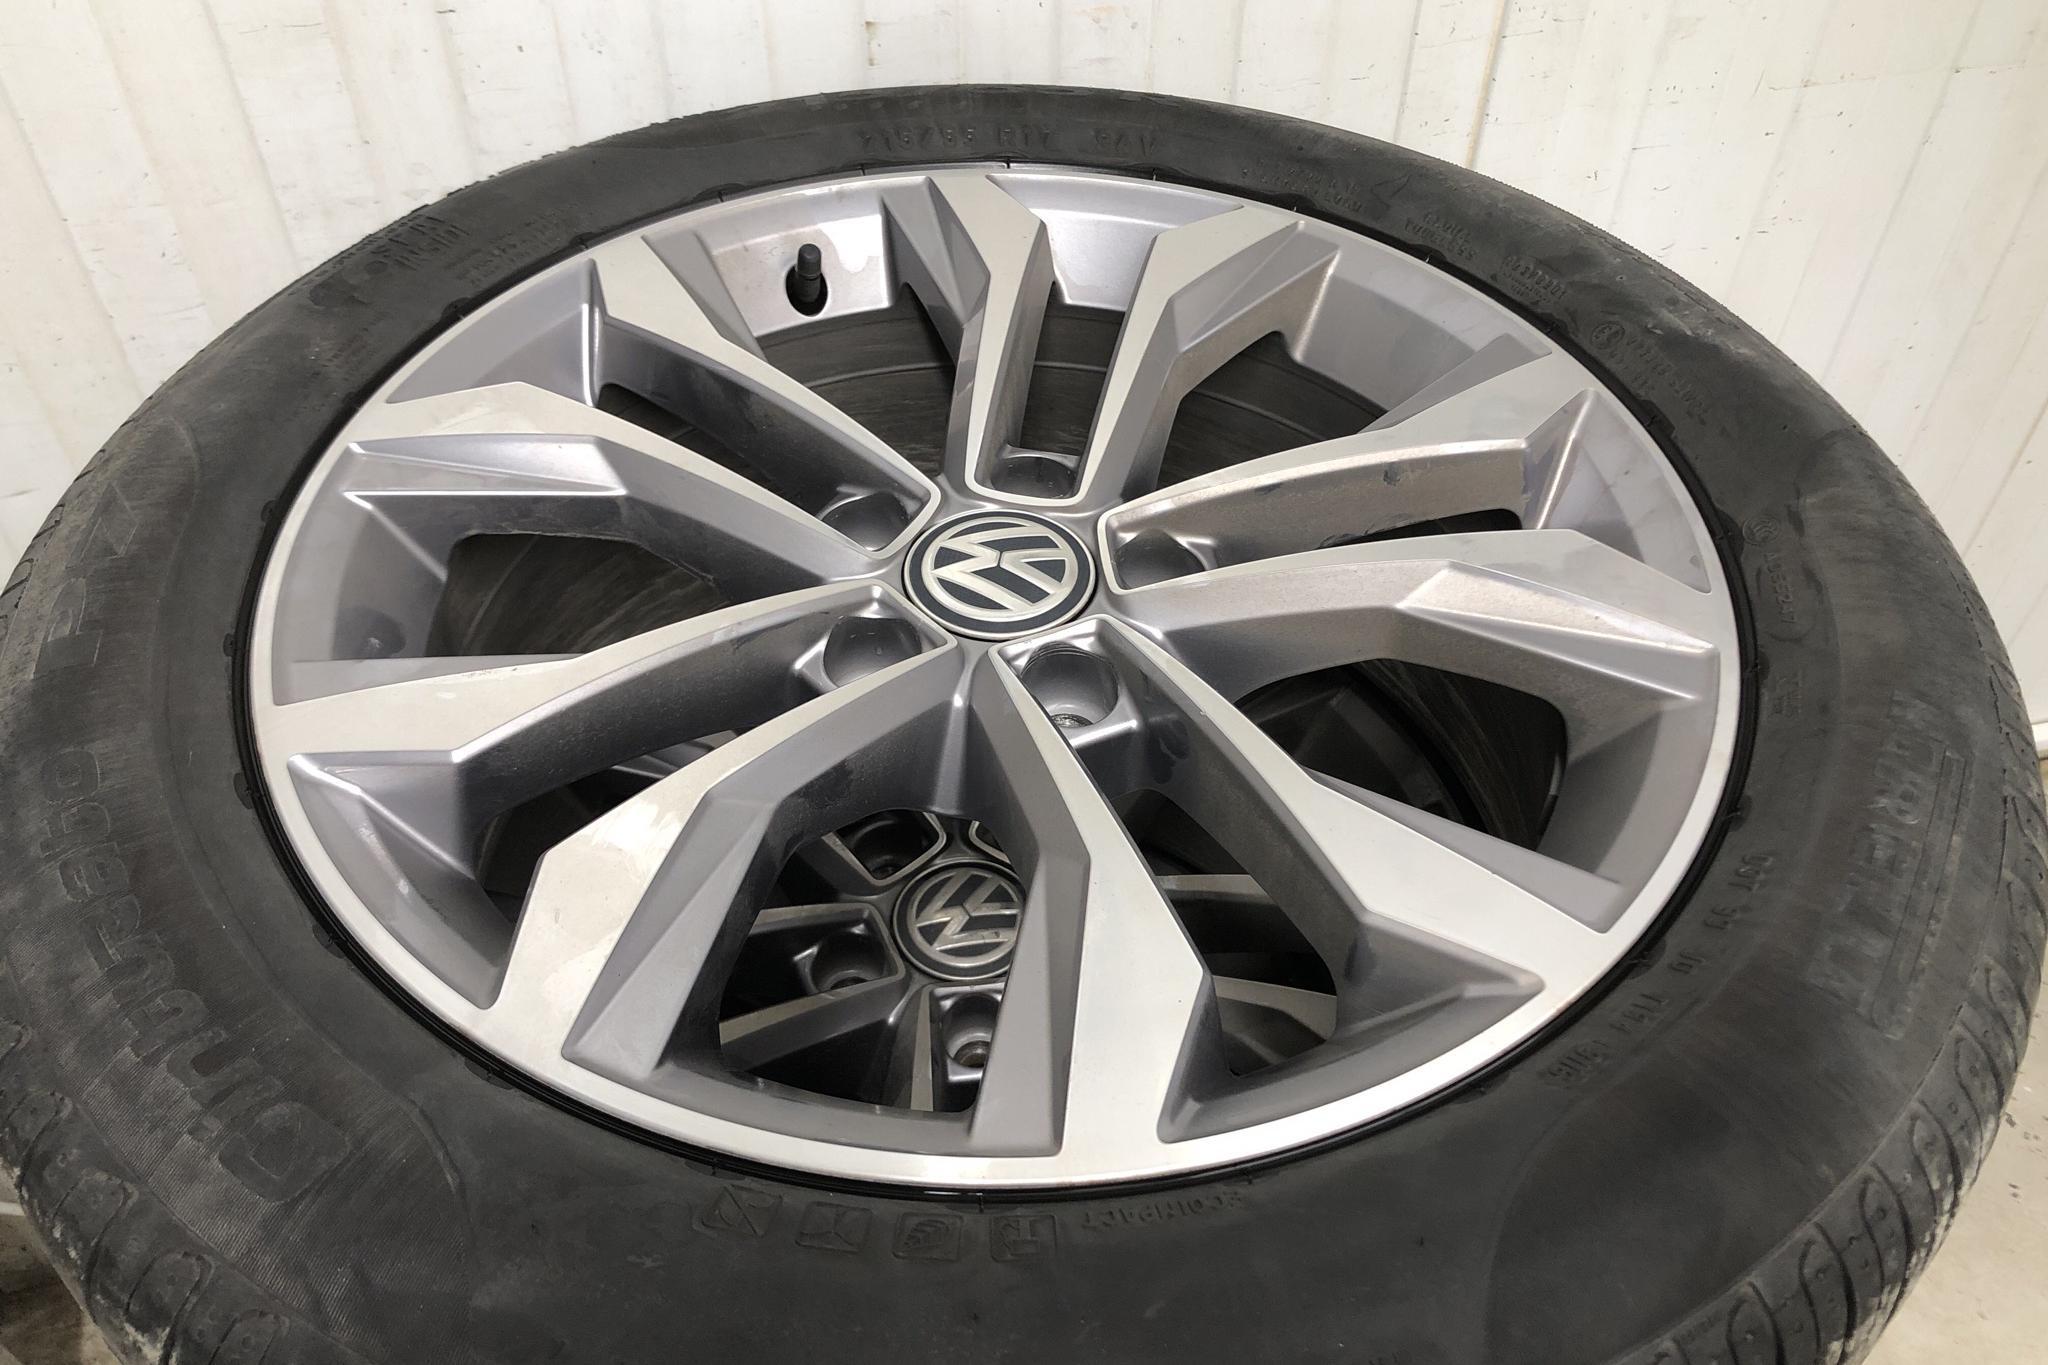 VW Passat 1.4 Plug-in-Hybrid Sportscombi (218hk) - 57 430 km - Automatic - Dark Blue - 2017